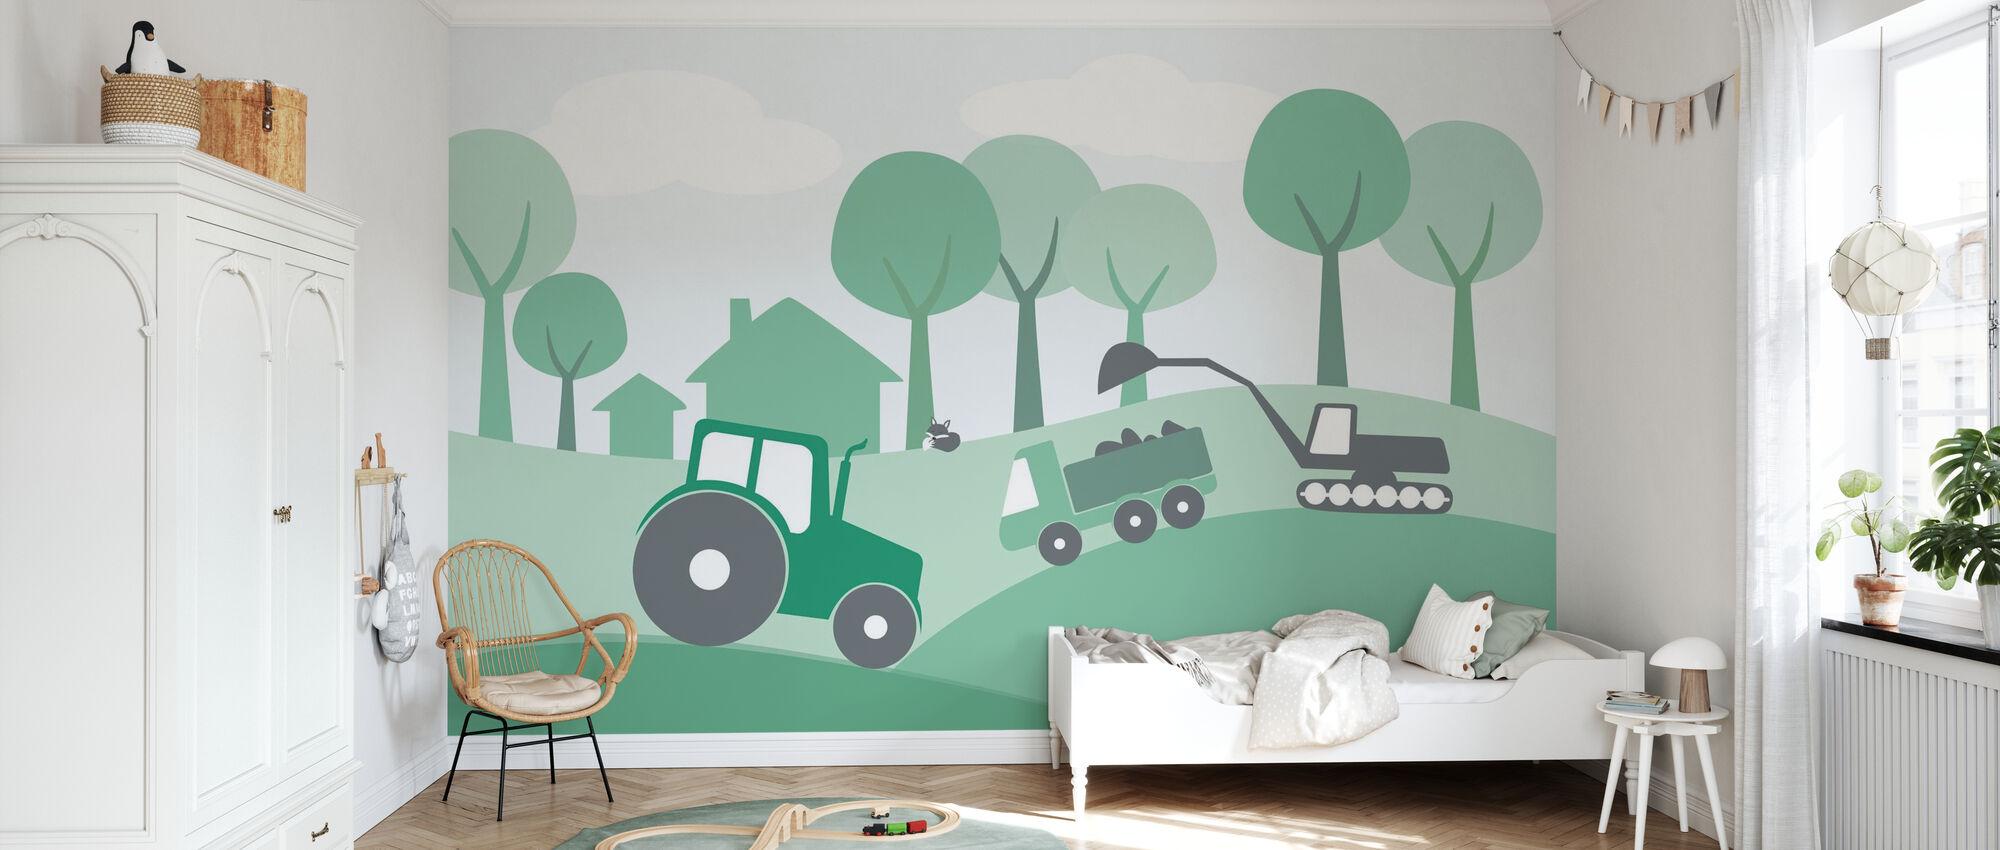 Countryside - Green - Wallpaper - Kids Room